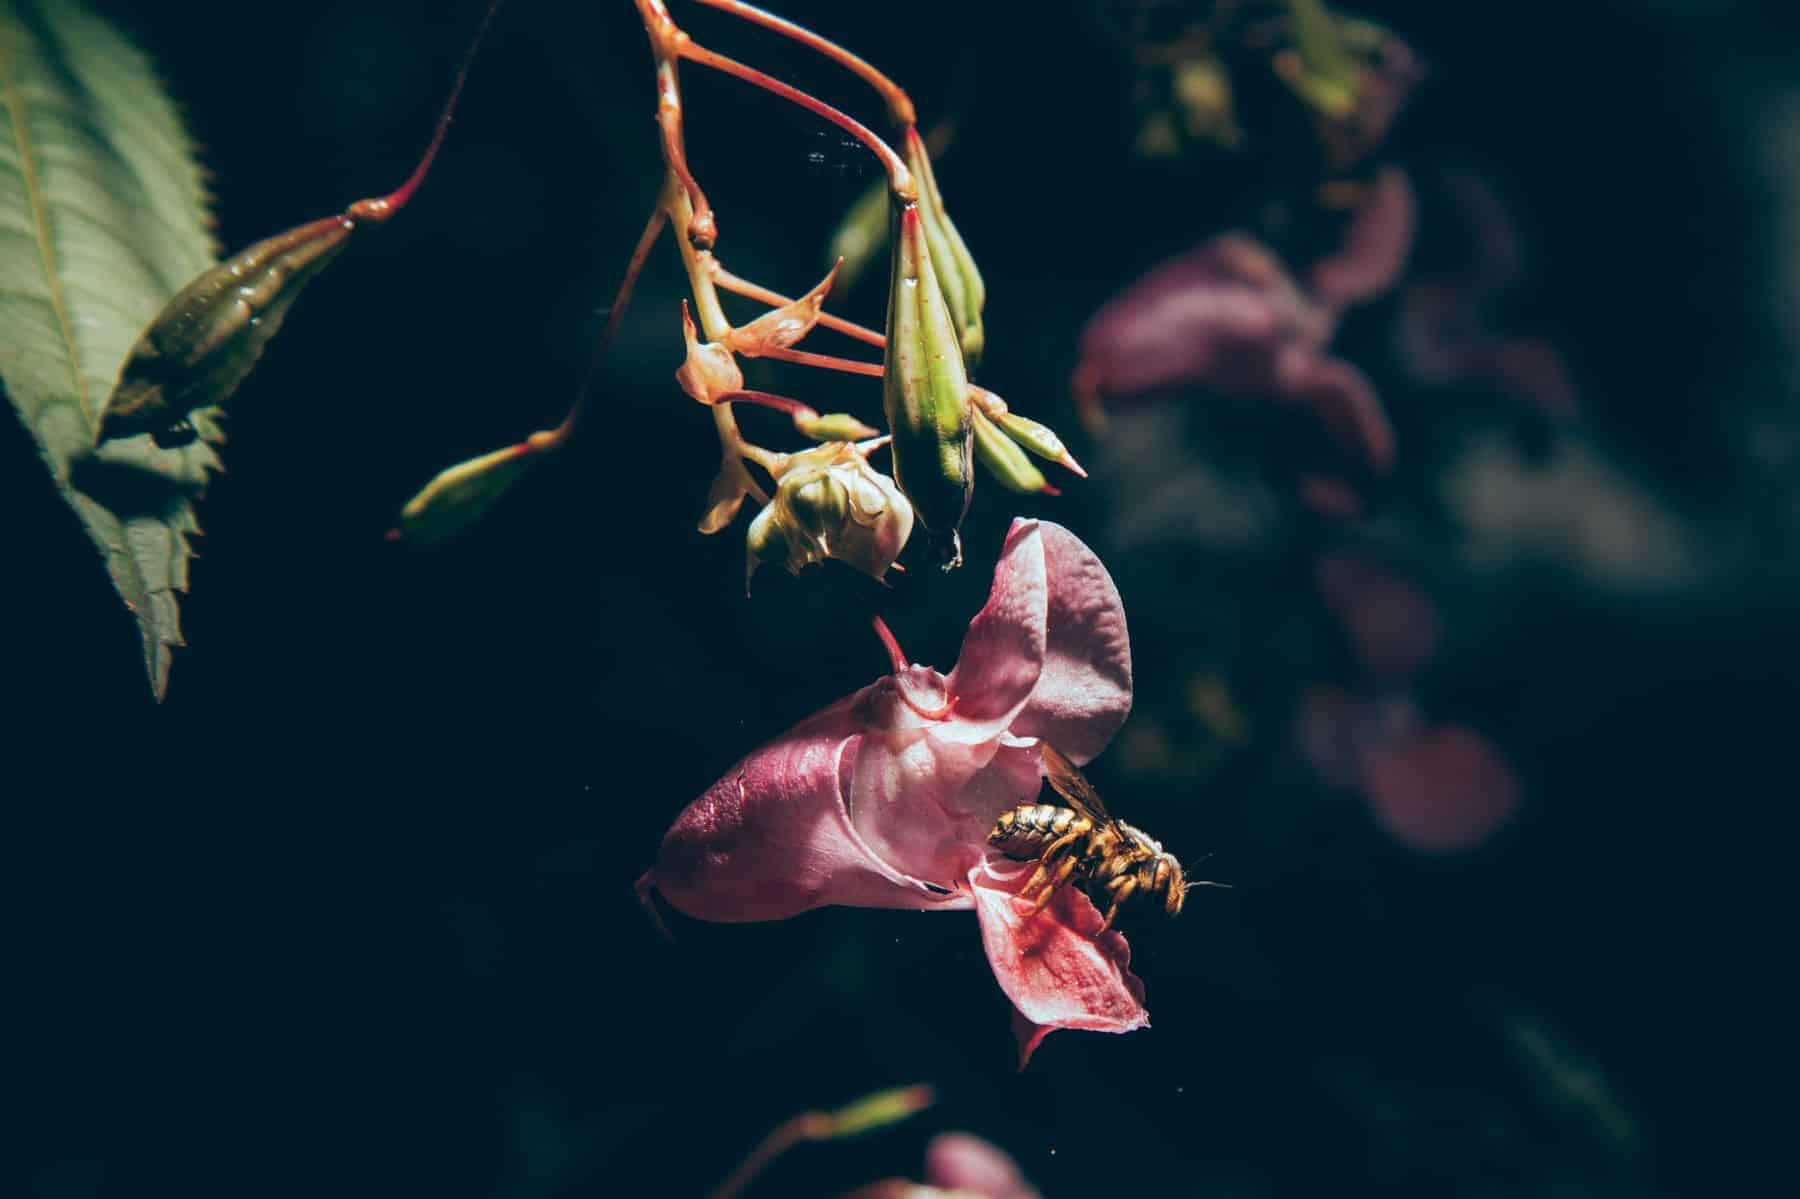 https://proart.photo - ProArt Photography